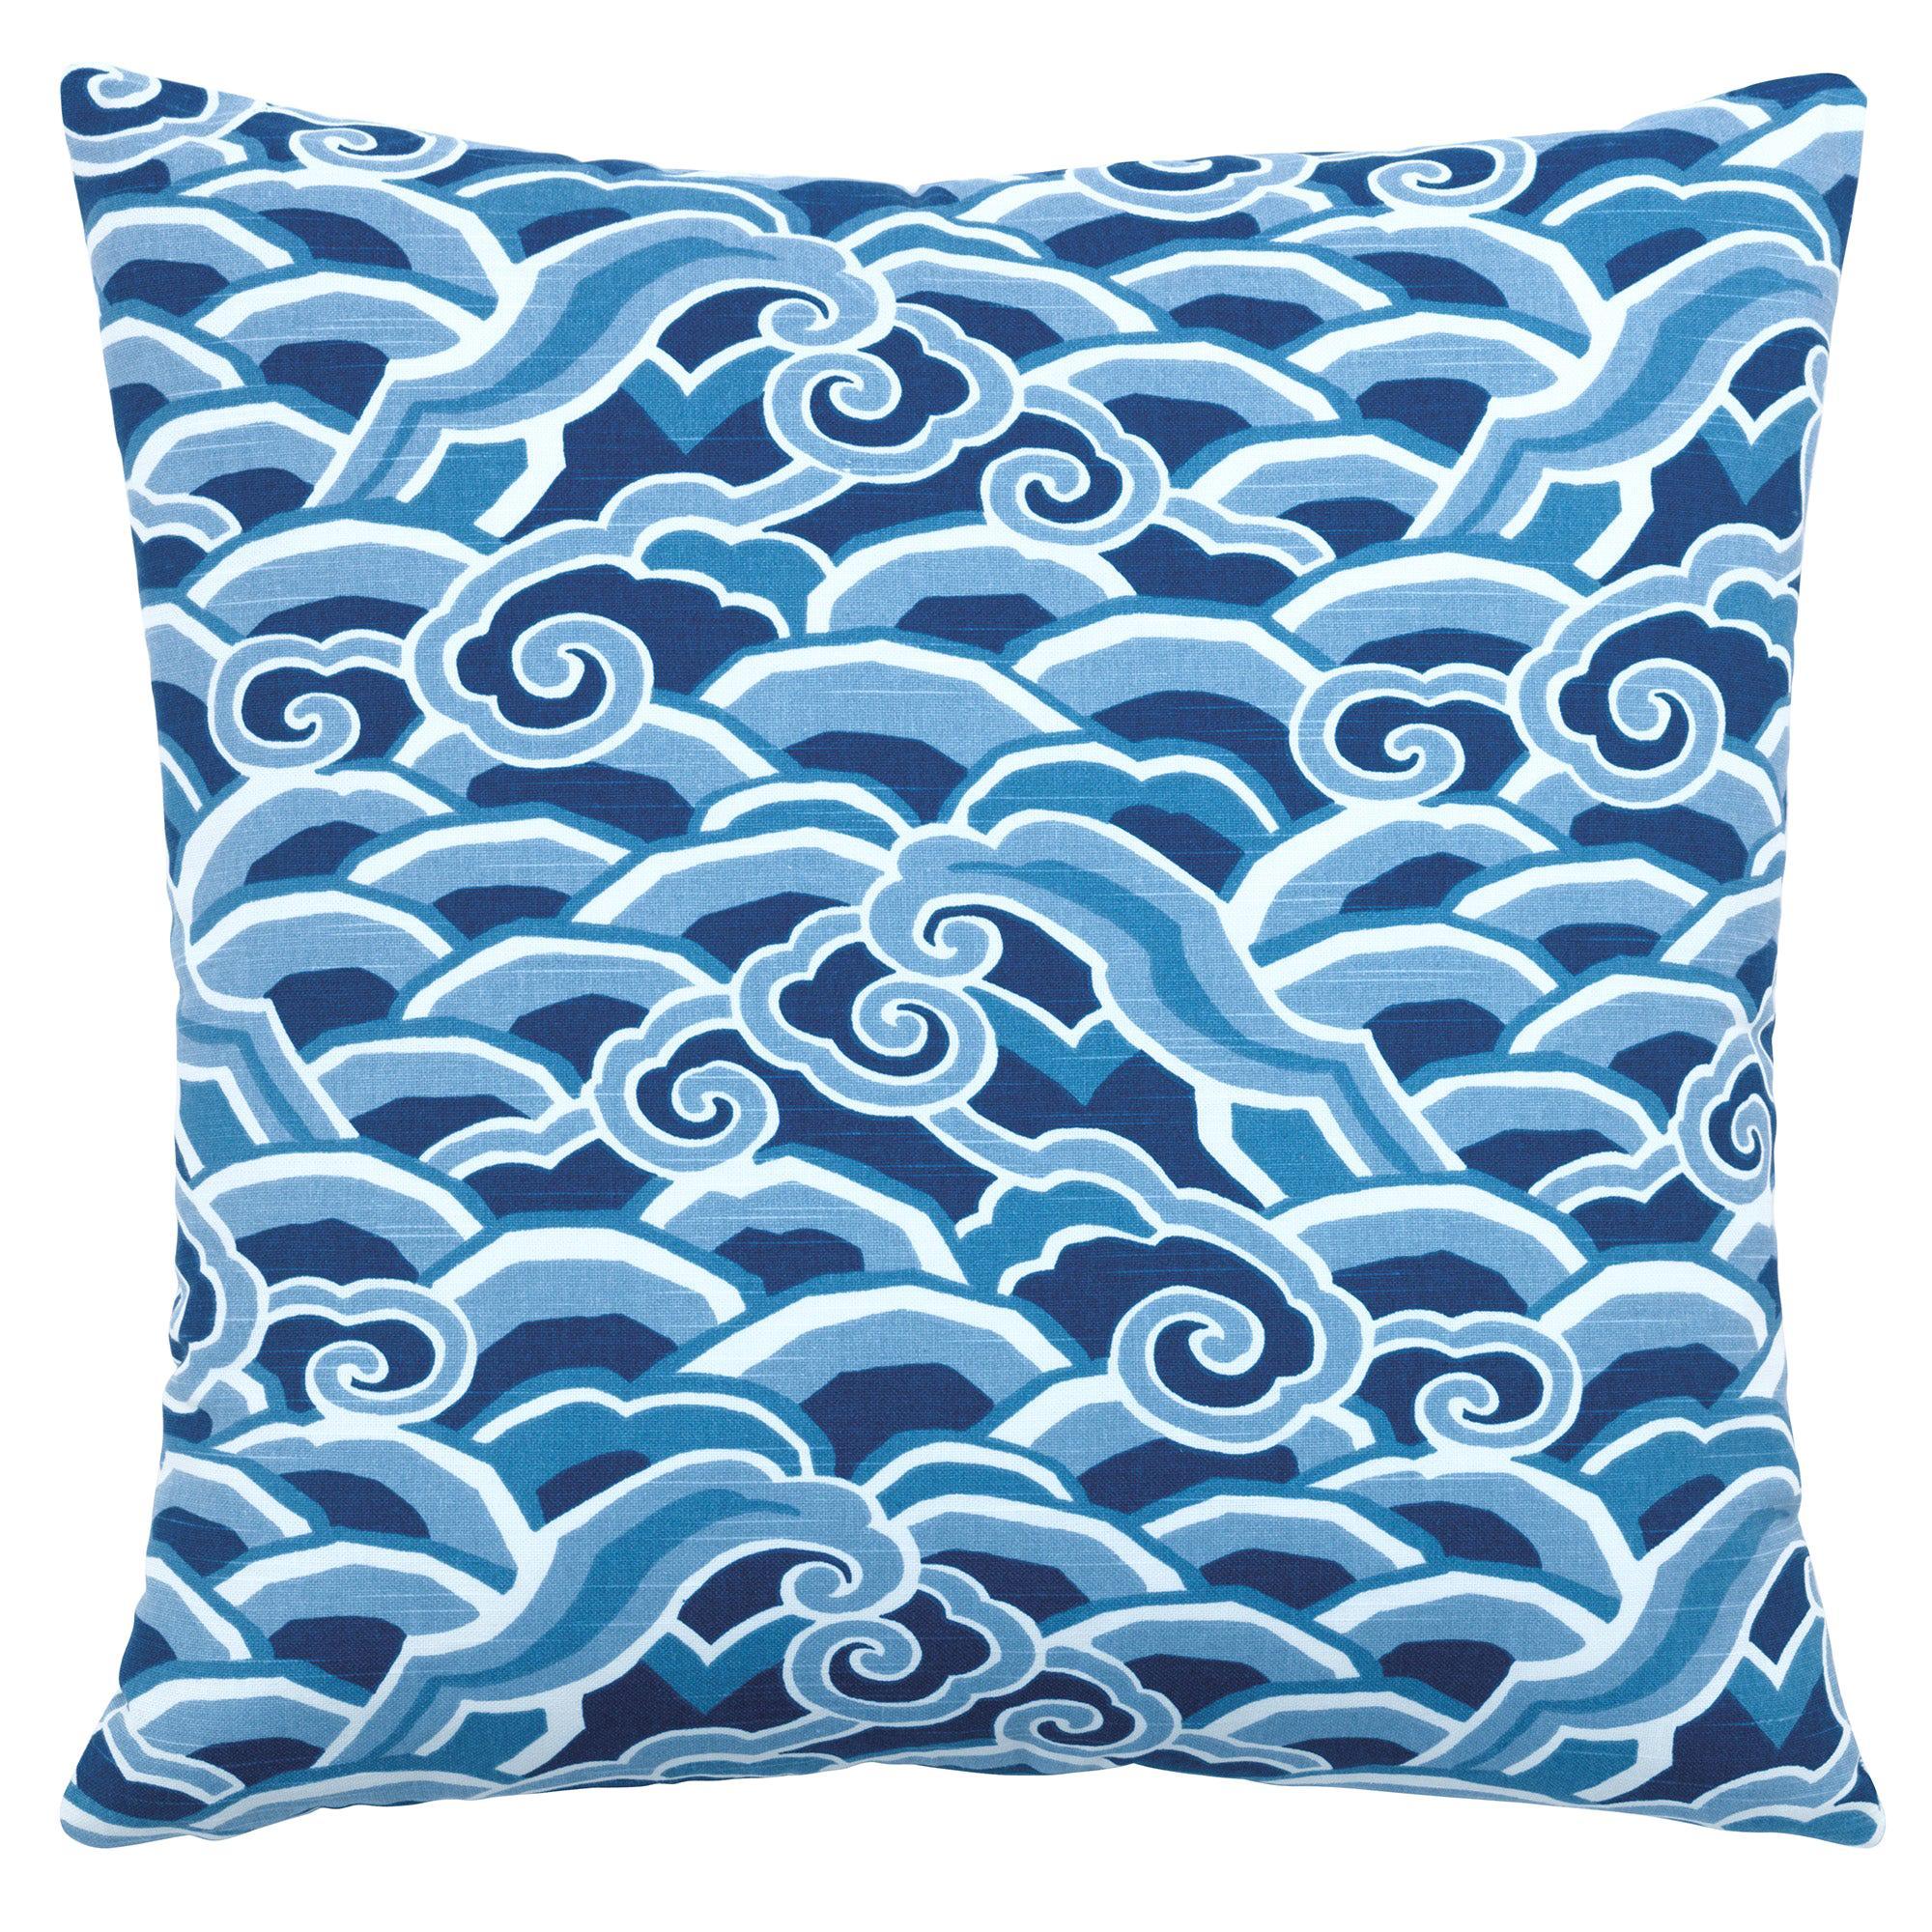 Decowaves Pillow in Ultramarine by CuratedKravet